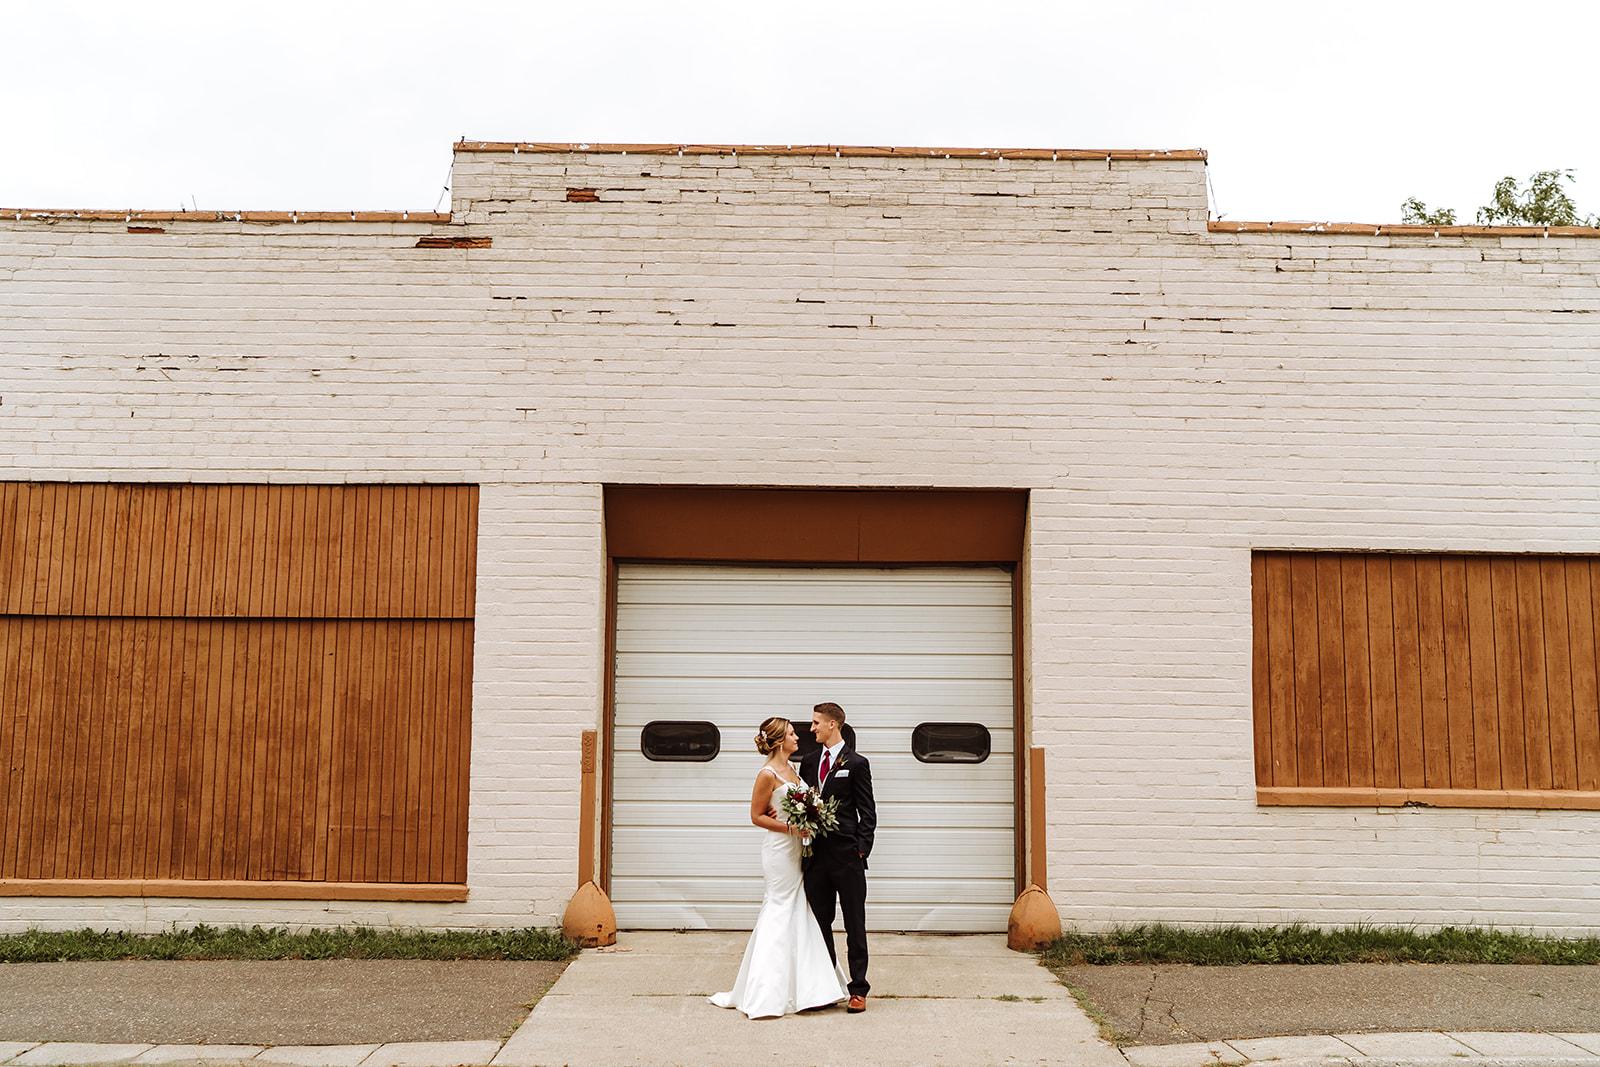 Scott and Andrea Wedding 2018-137.jpg